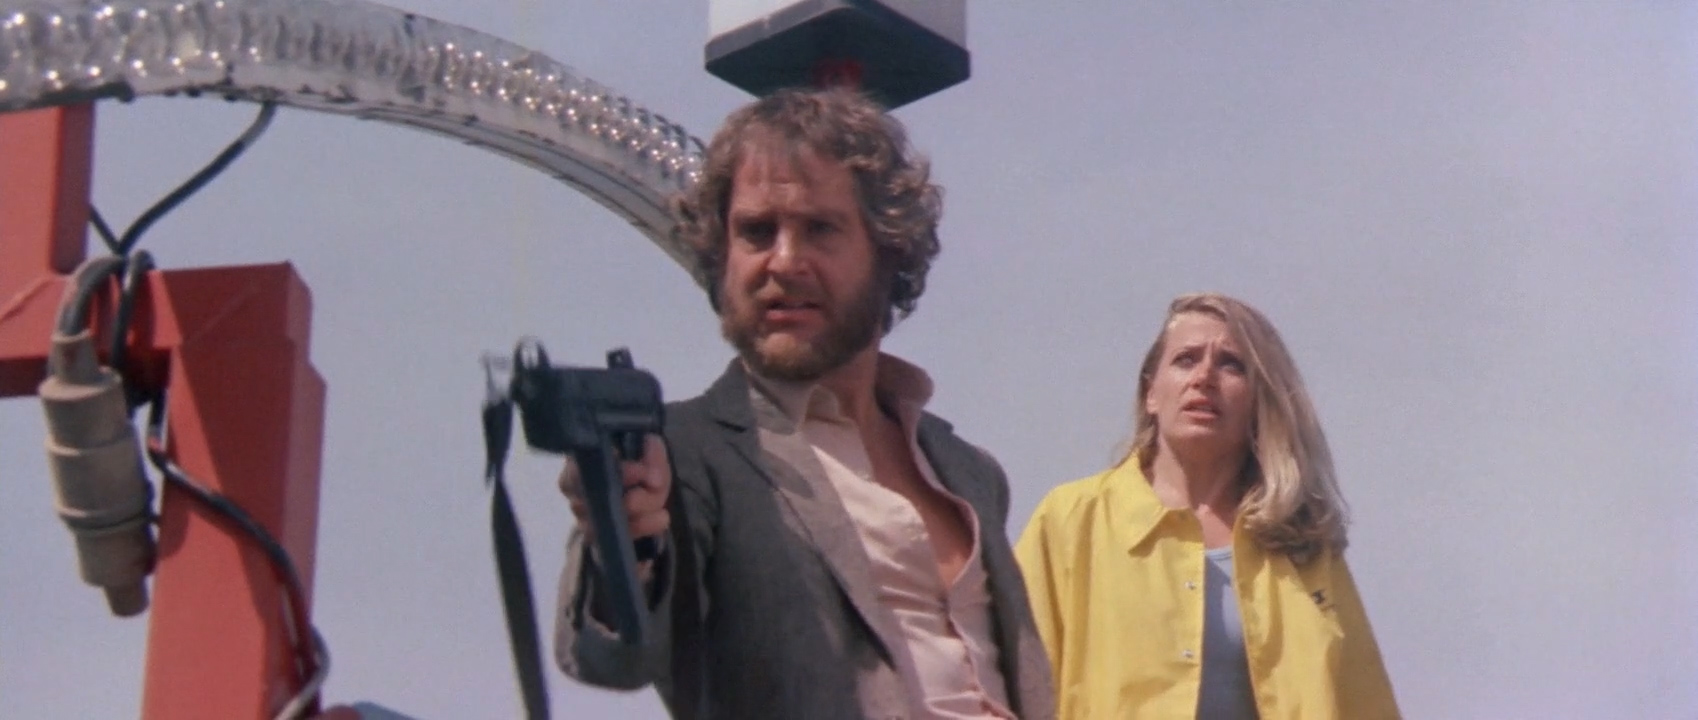 Hugo Stiglitz and Laura Trotter in Nightmare City (1980)